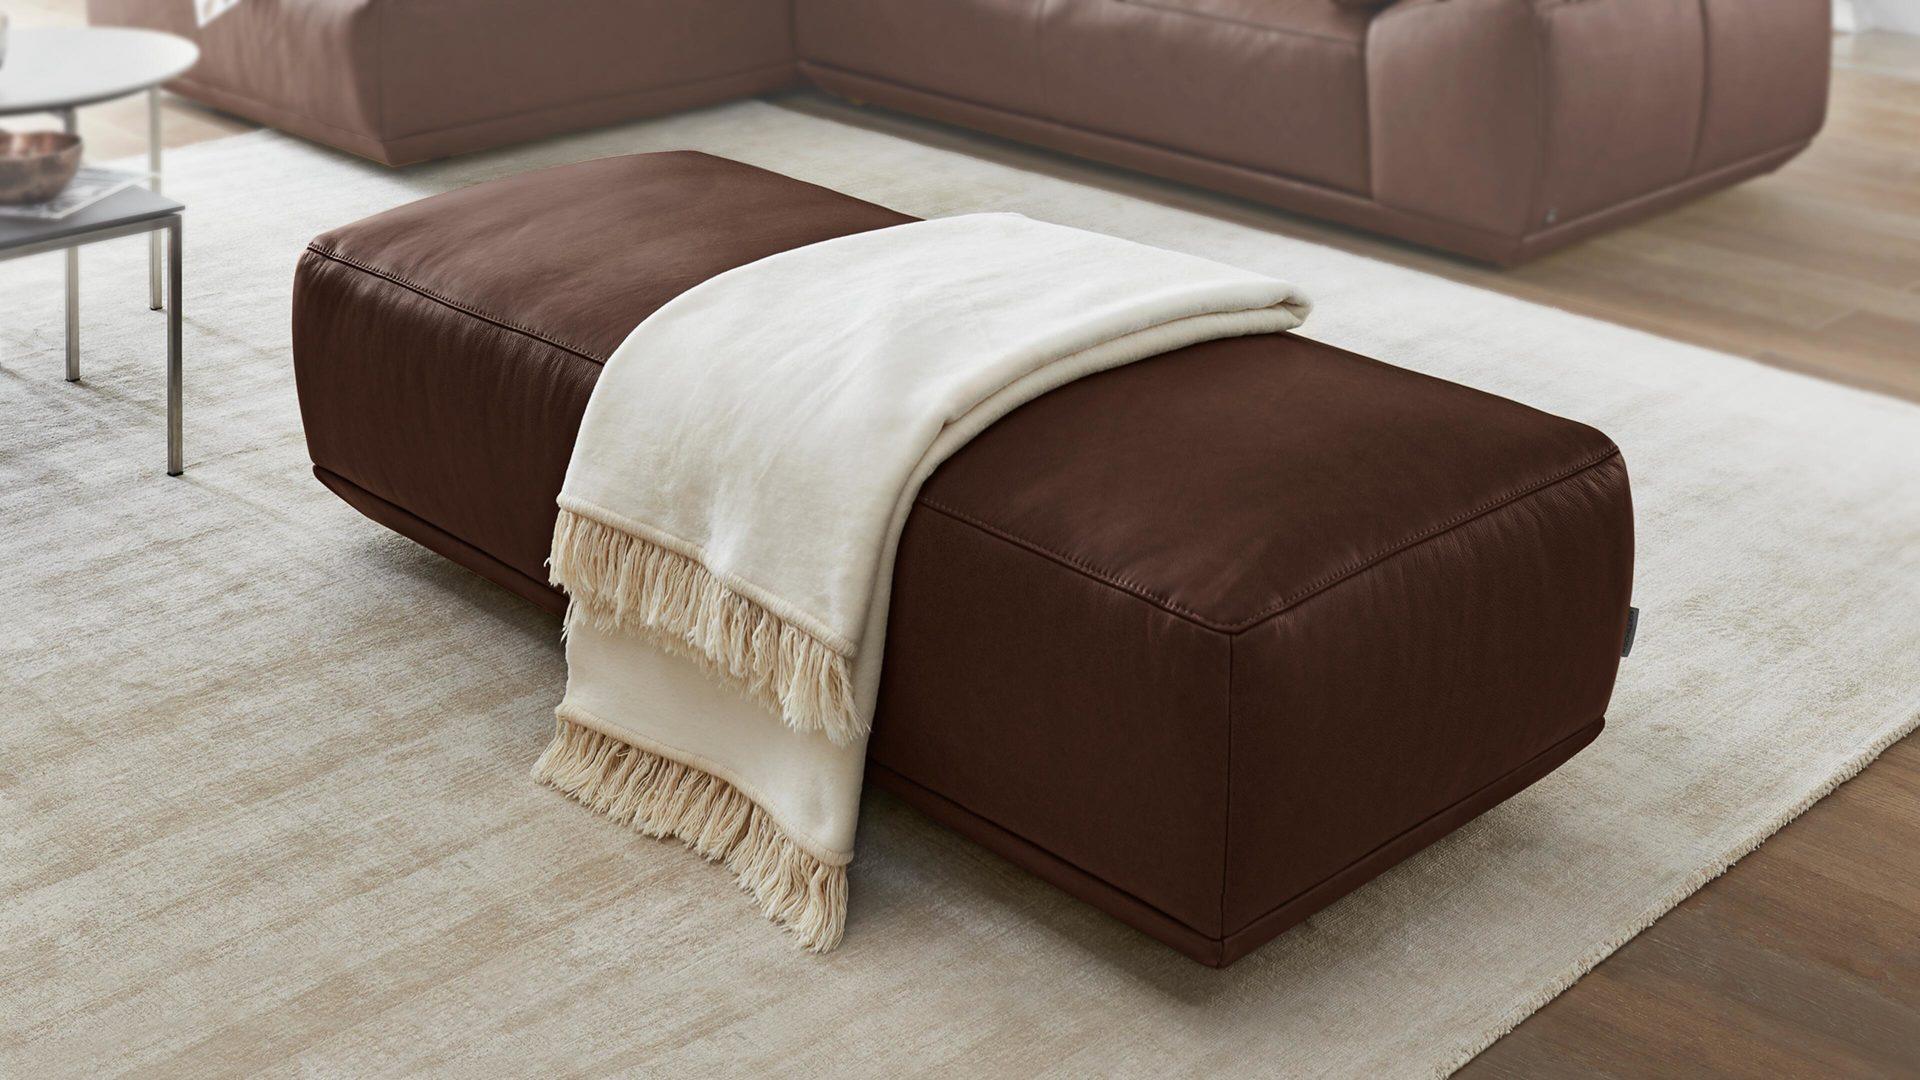 Interliving Sofa Serie 4000 Xxl Hocker Chocolatefarbenes Longlife